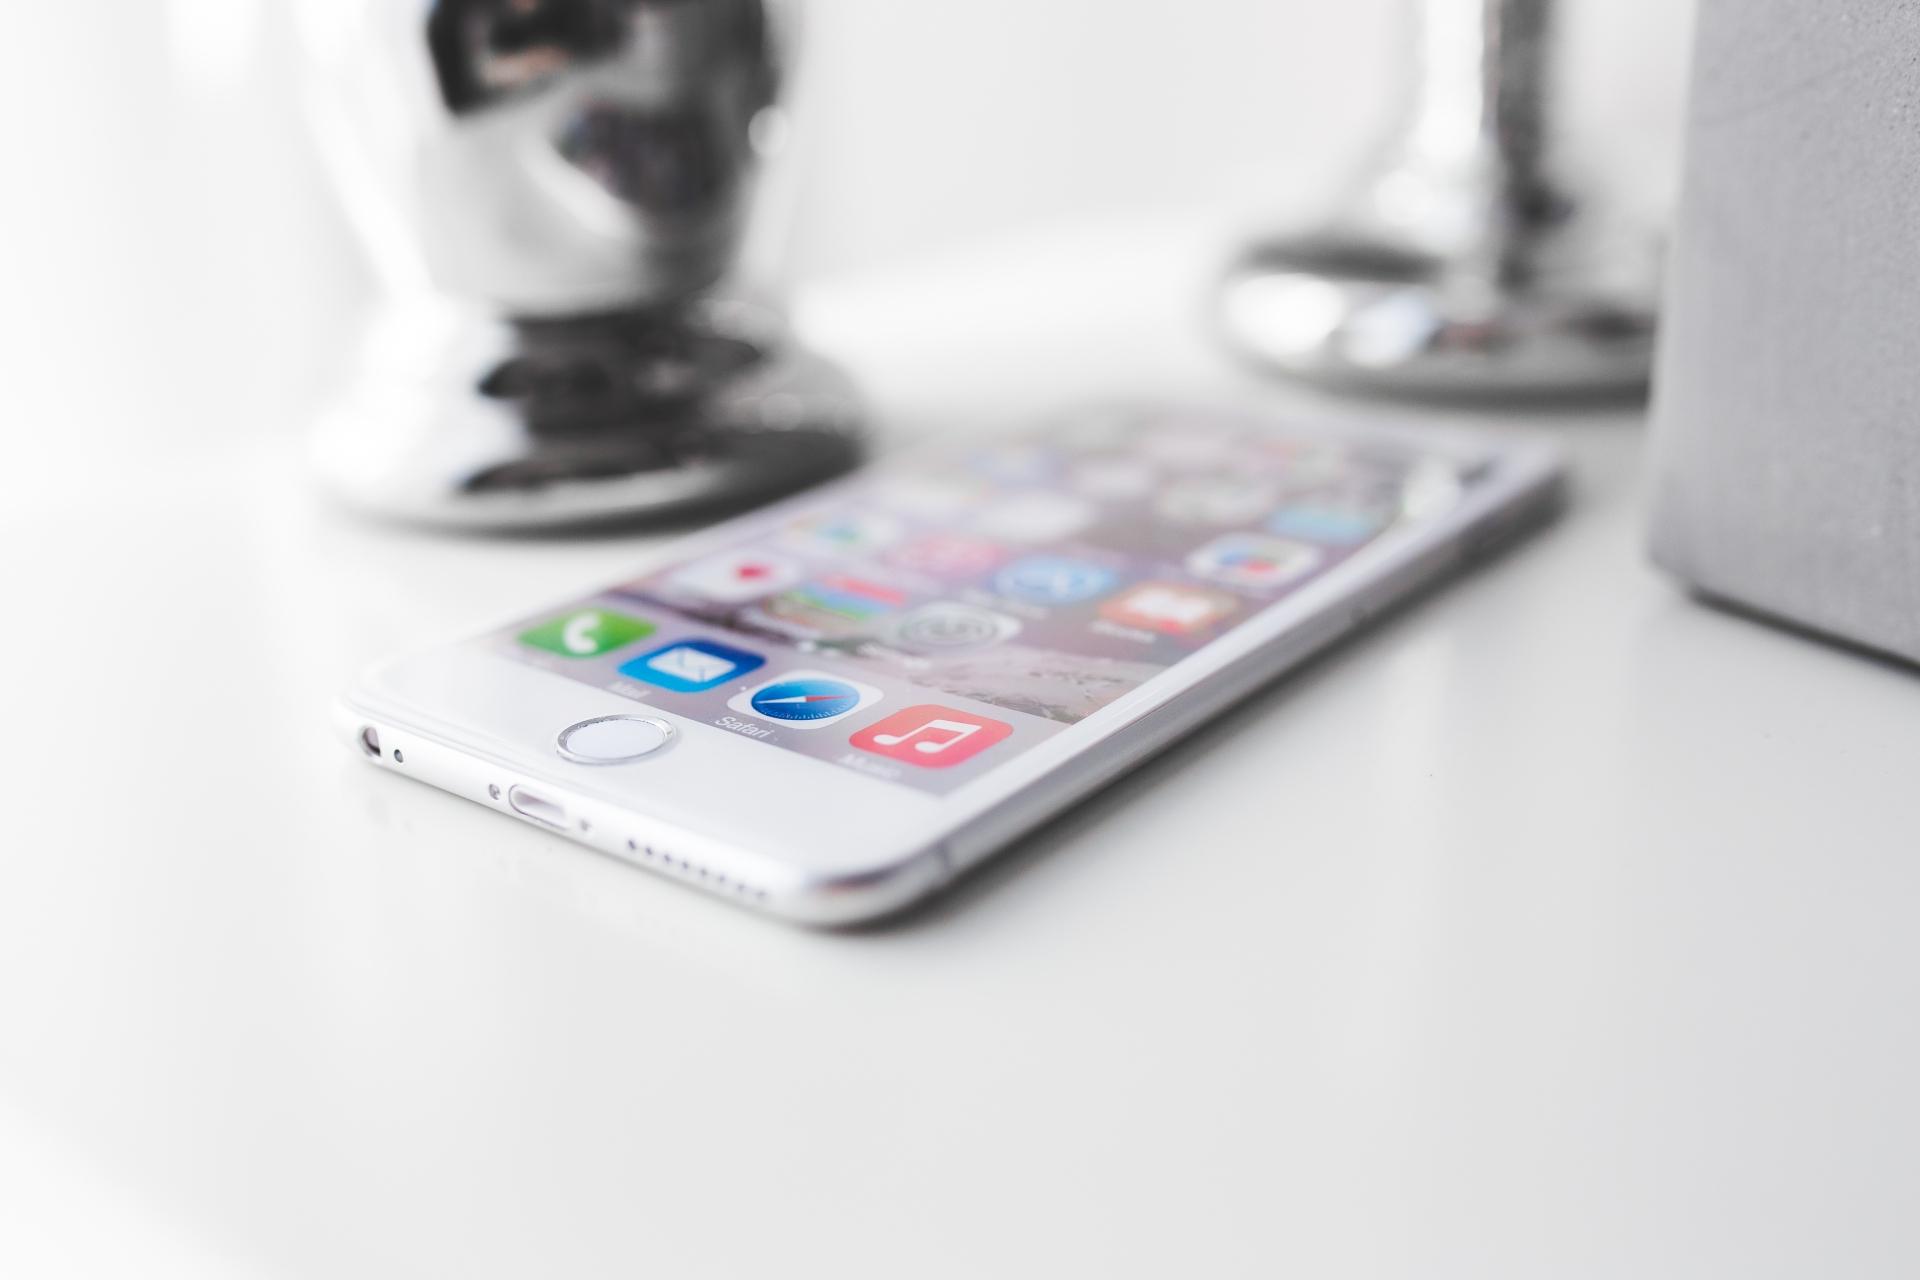 iPhone Apple Portugal Pedro Topete Apple Blog